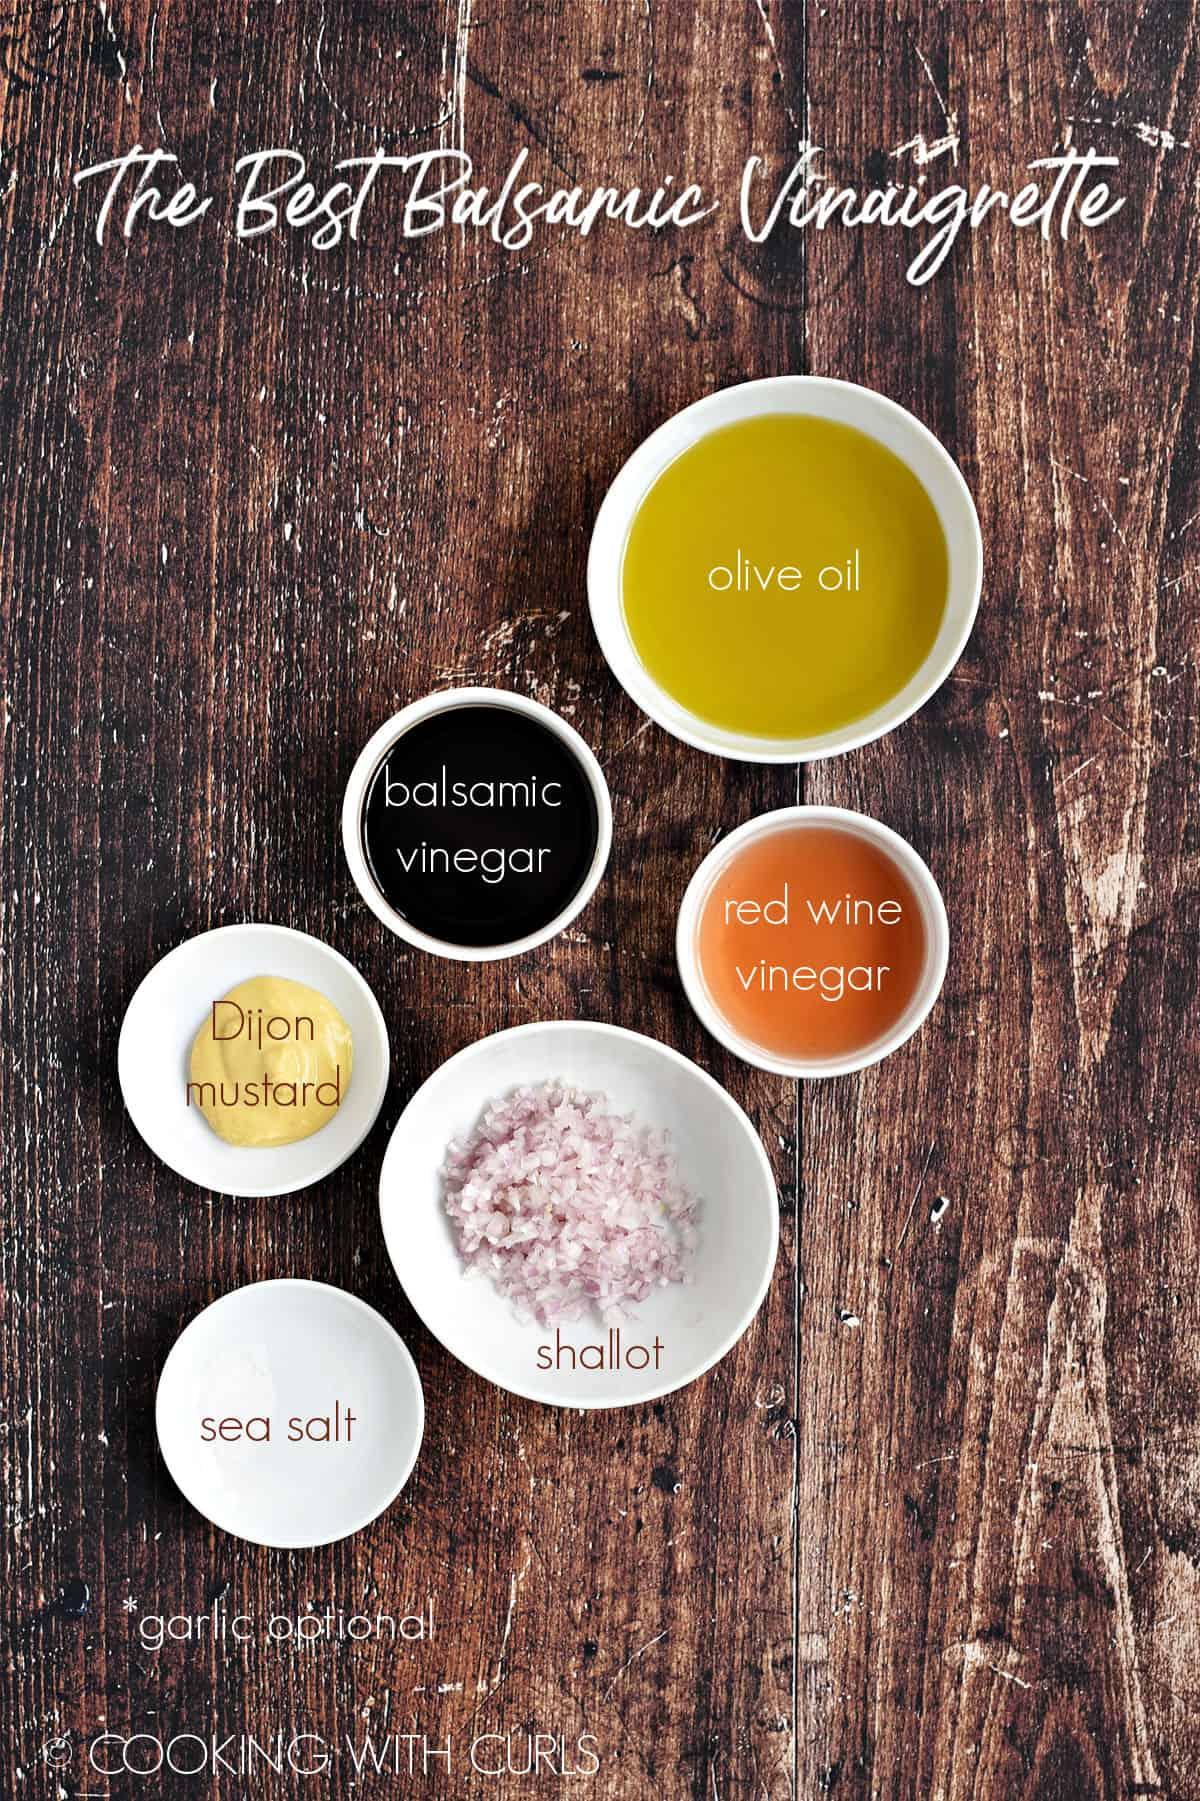 Ingredients to make The Best Balsamic Vinaigrette.